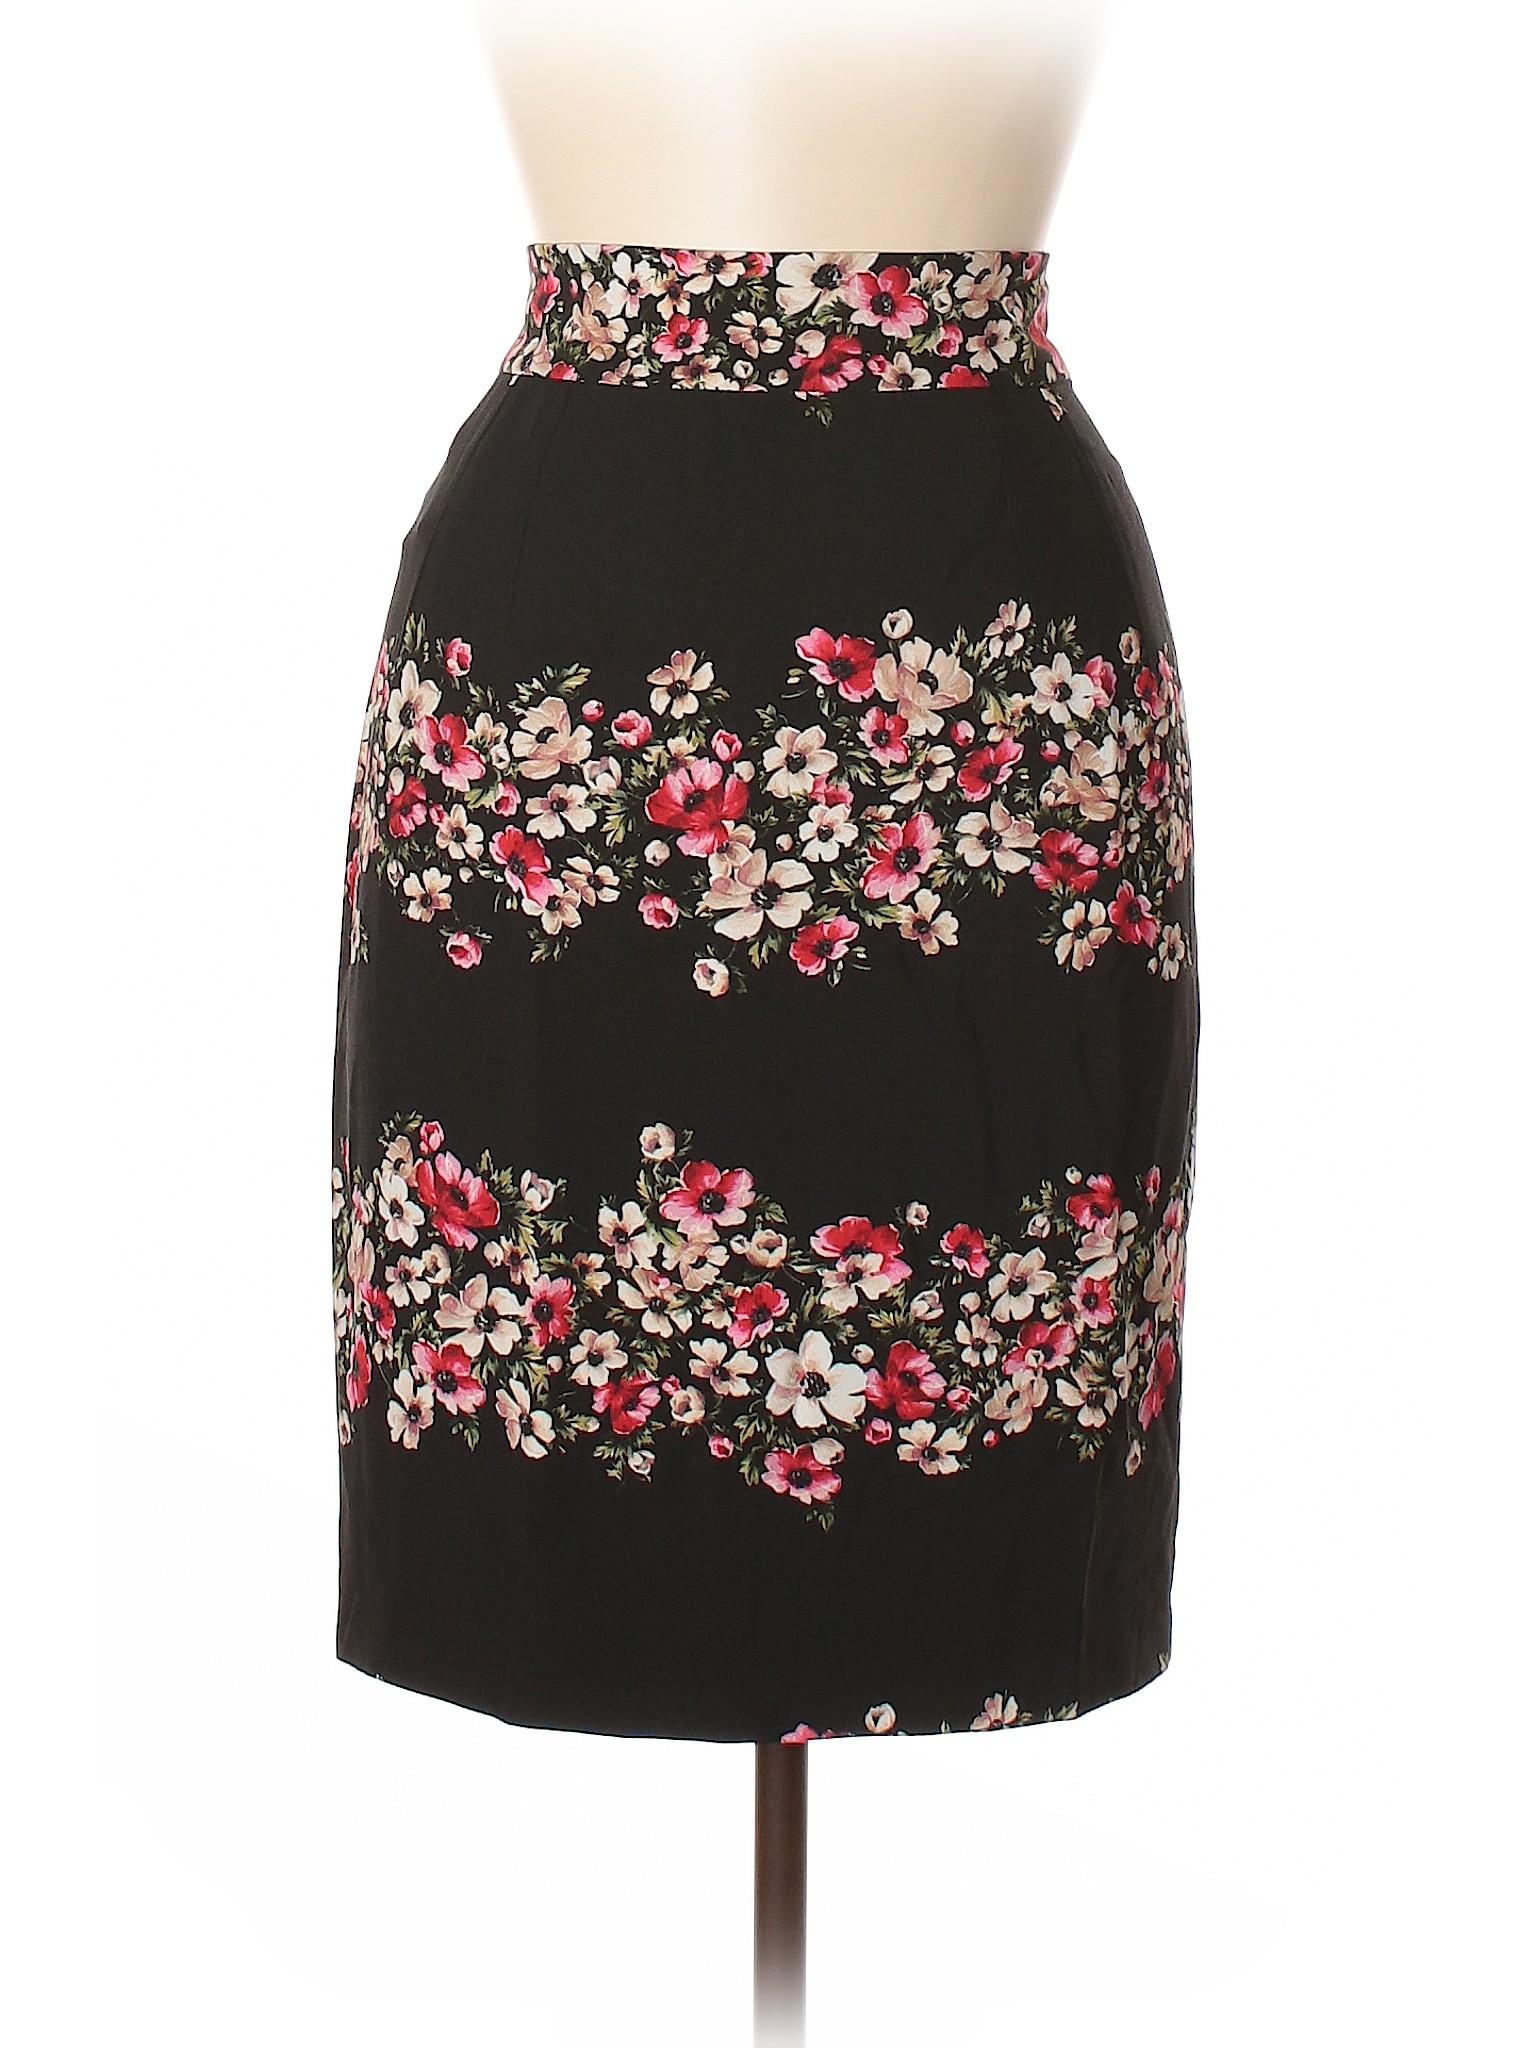 Boutique Casual Boutique Casual Skirt Boutique Skirt Casual Skirt Boutique Casual OTqTrxwtX